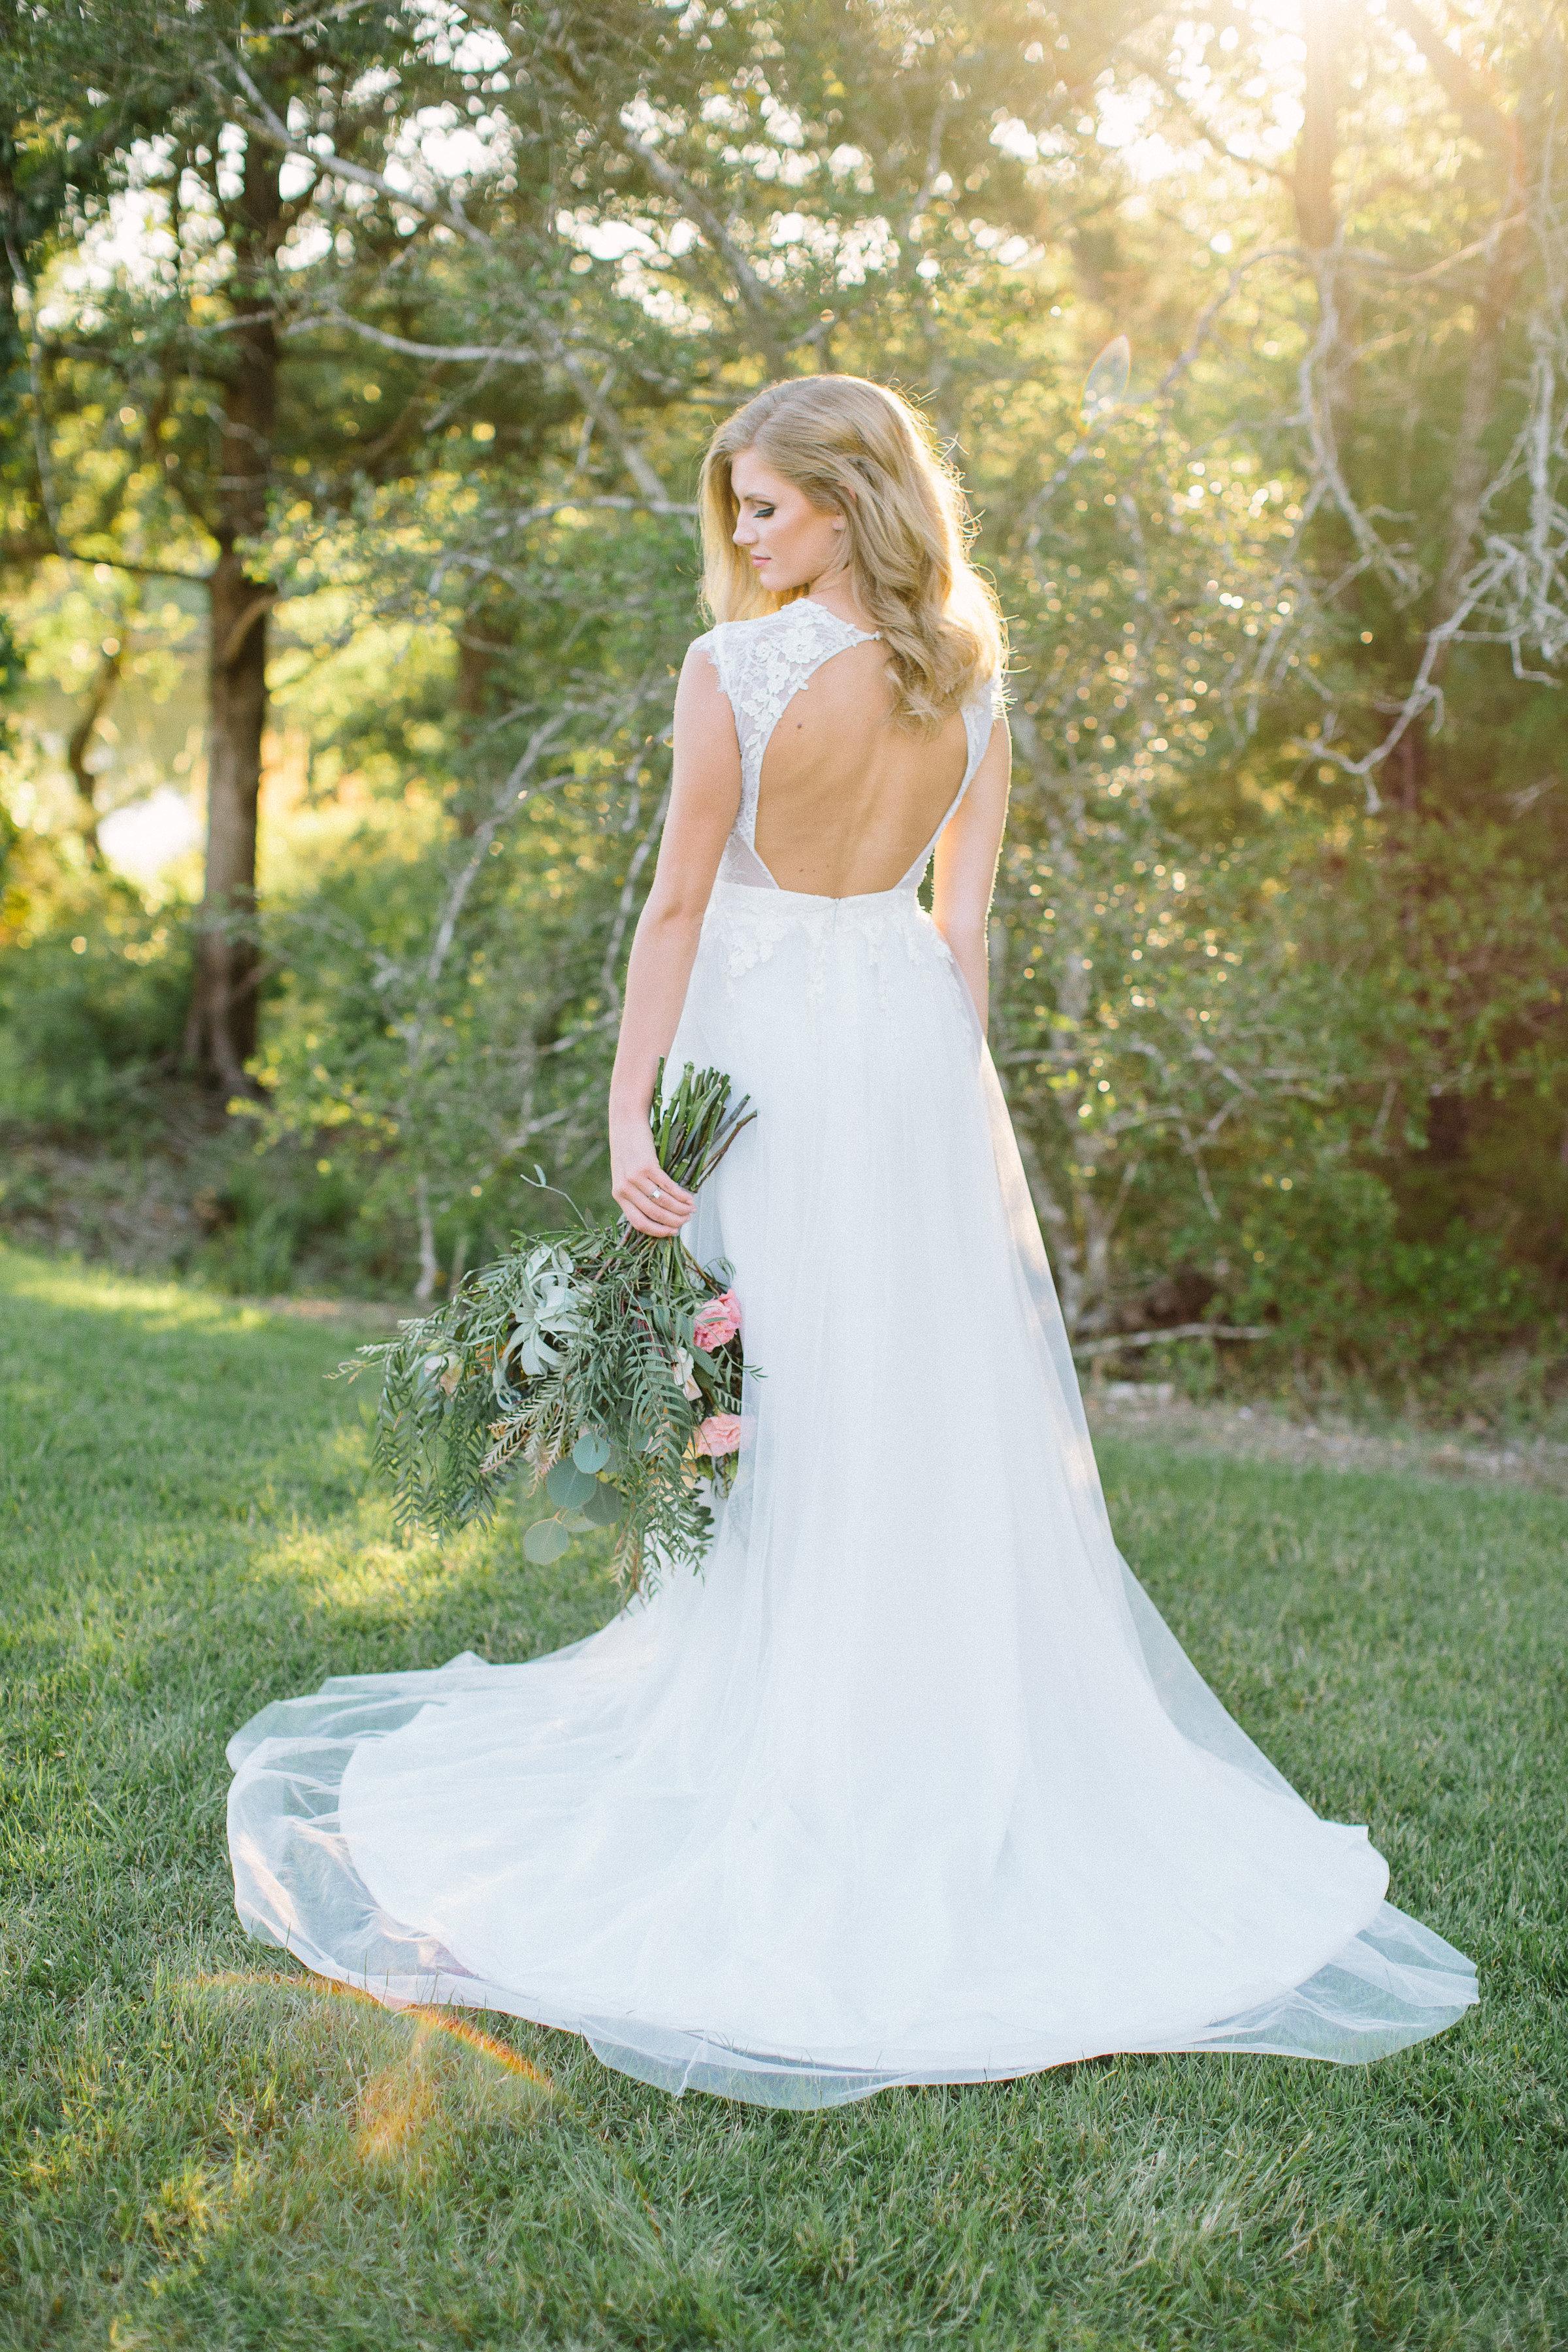 Ellen-Ashton-Photography-Peach-Creek-Ranch-Weddings-Wed-and-Prosper271